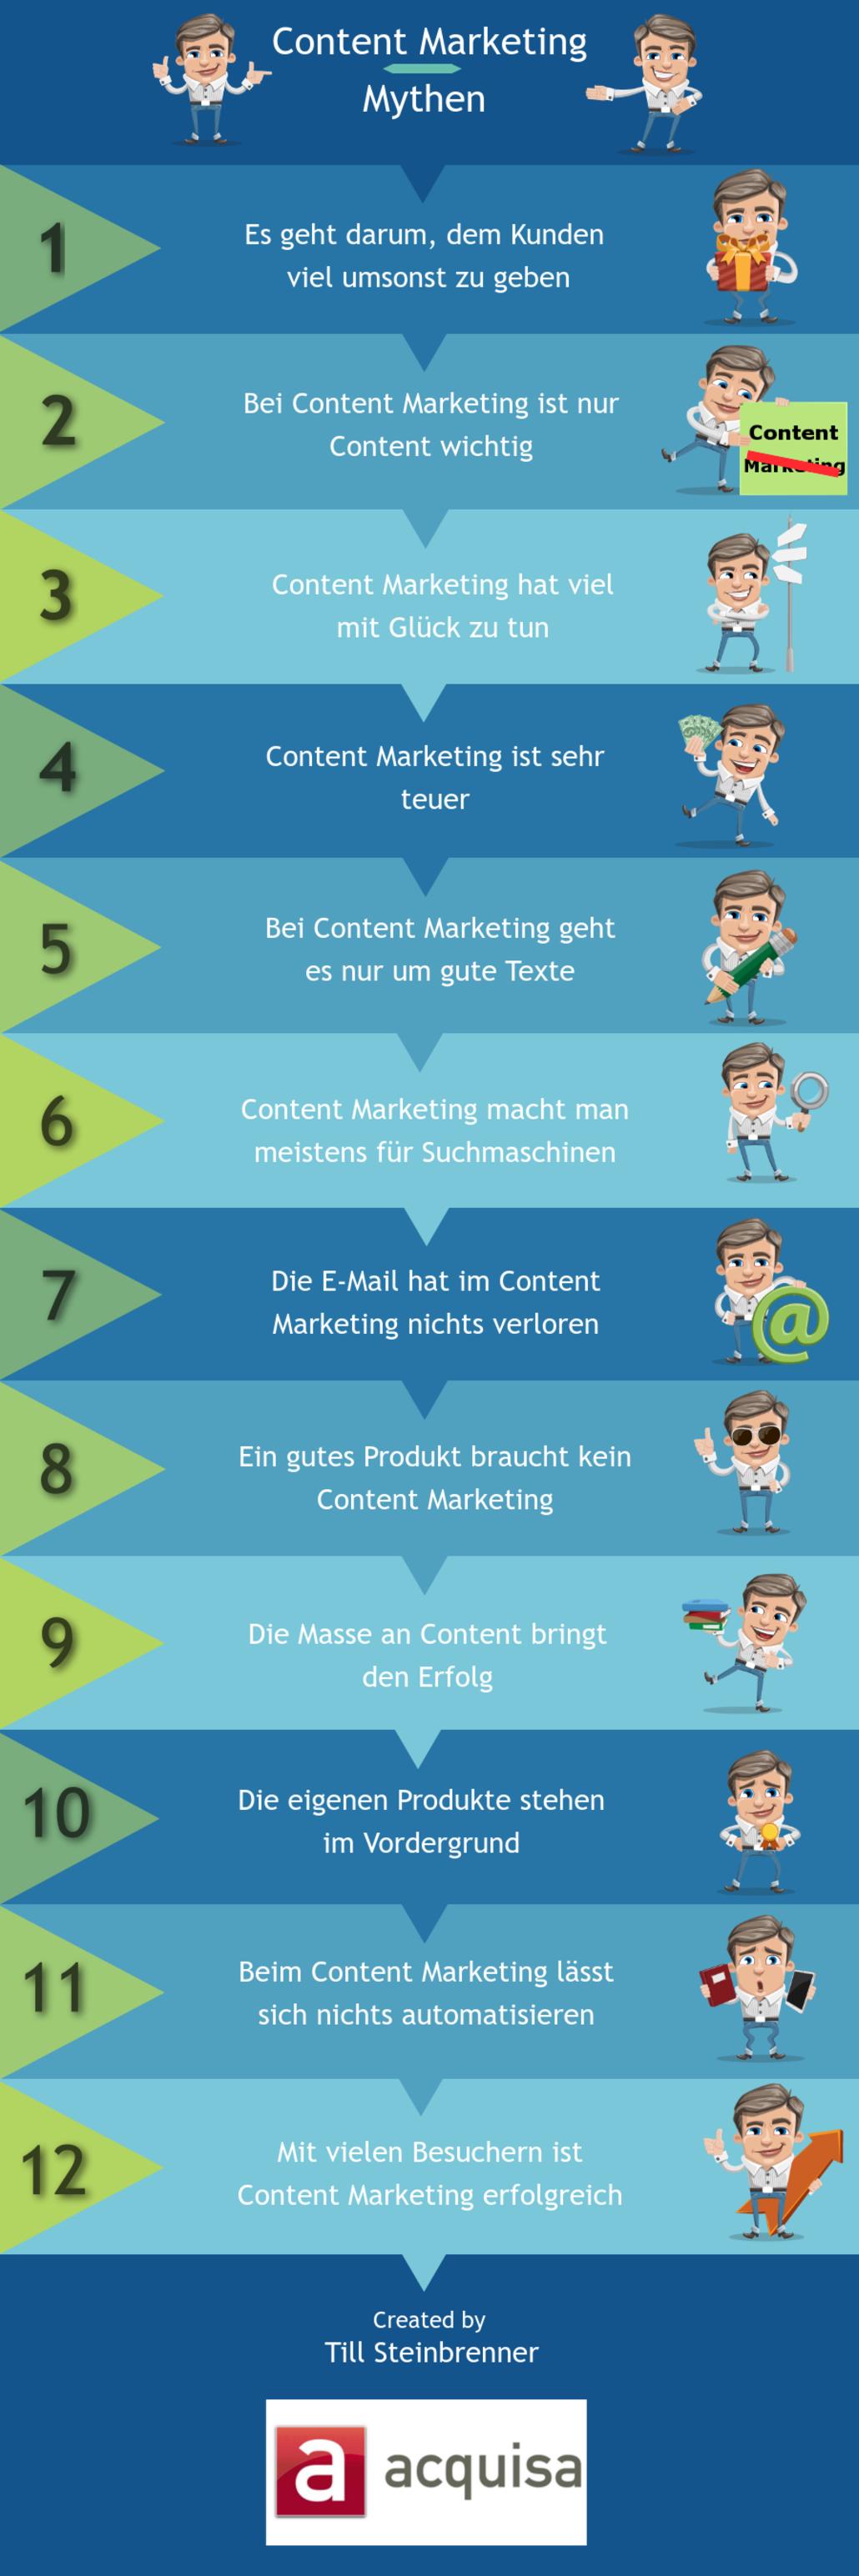 infografik-content-marketing-mythen-320454-2